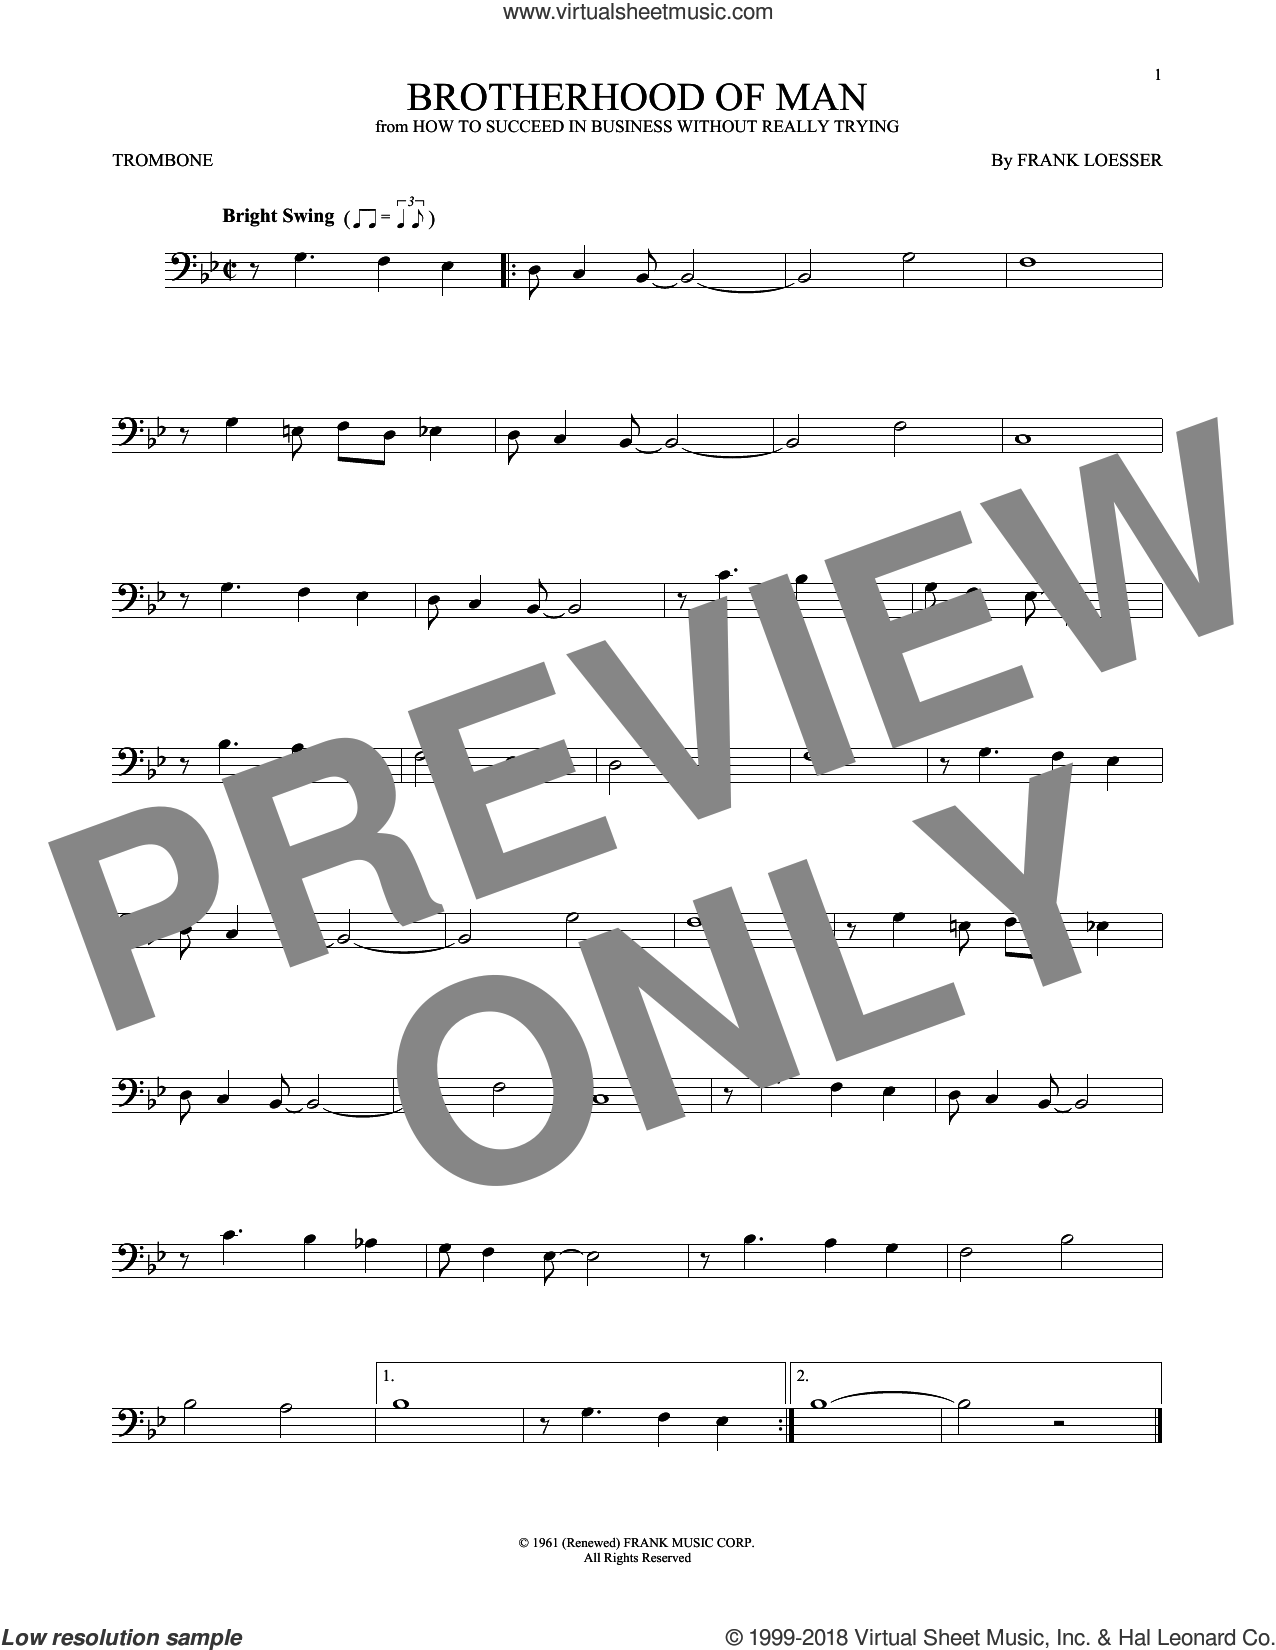 Brotherhood Of Man sheet music for trombone solo by Frank Loesser, intermediate skill level